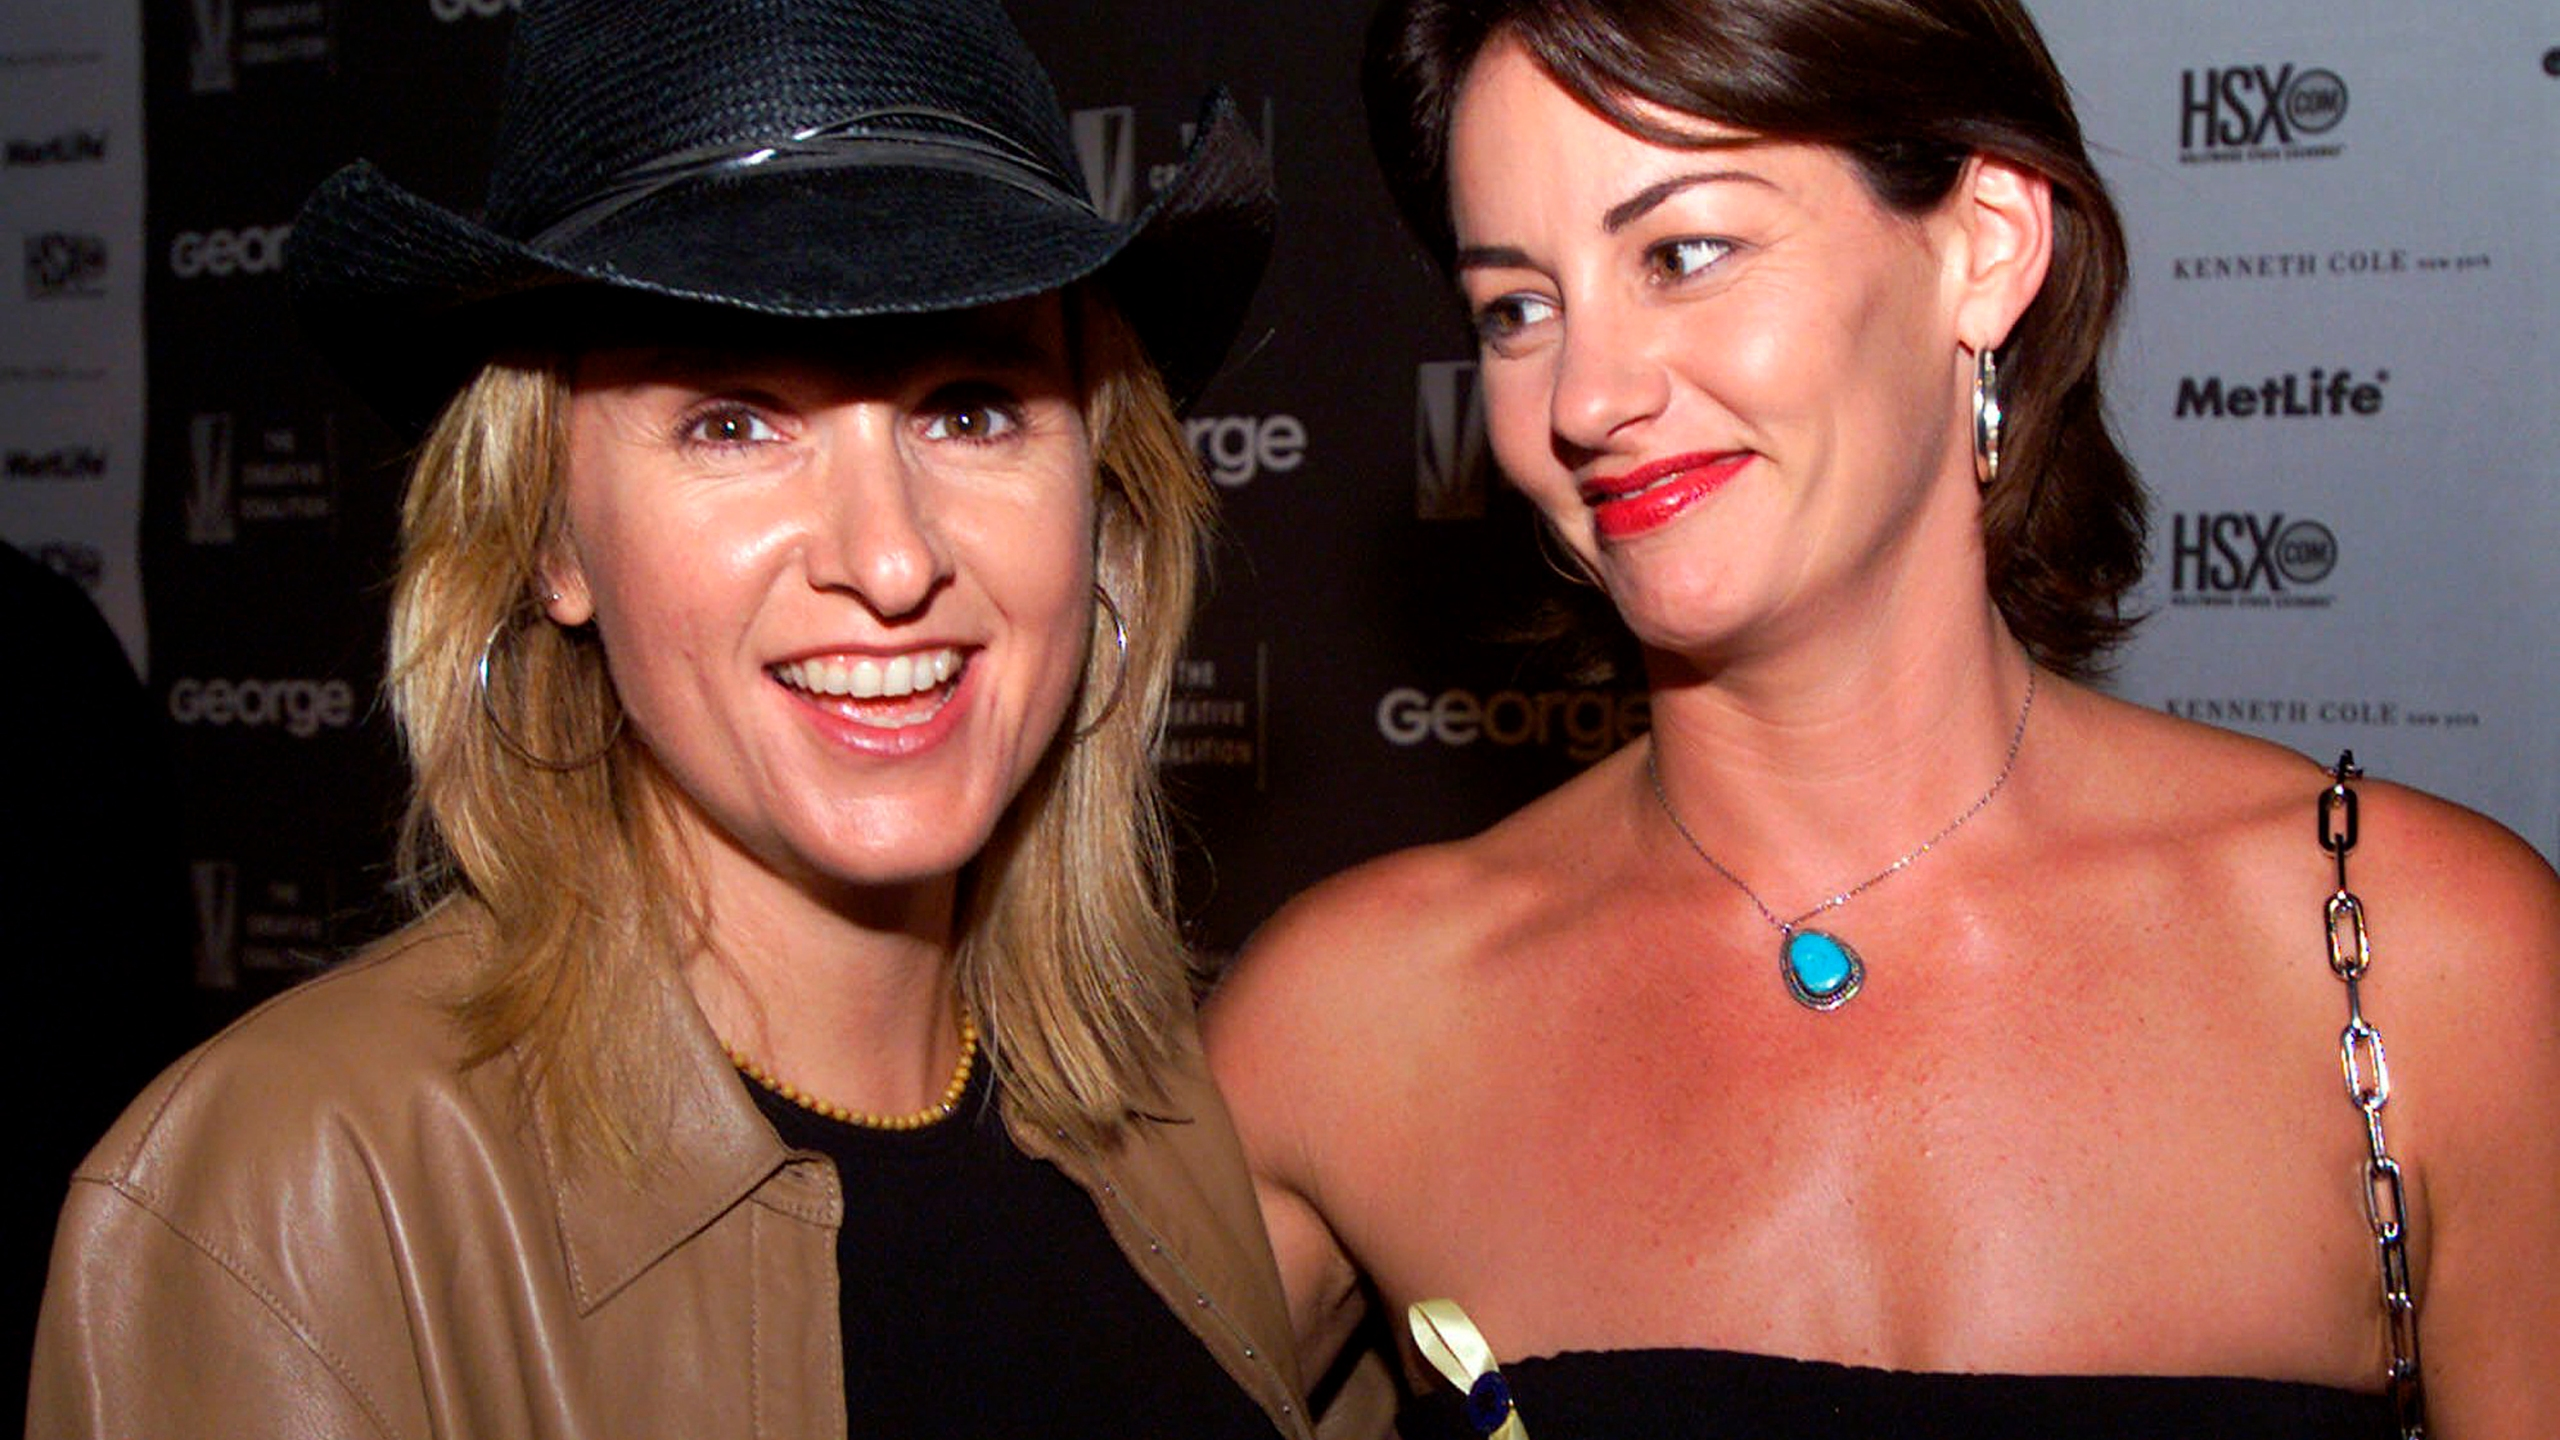 Melissa Etheridge, Julie Cypher